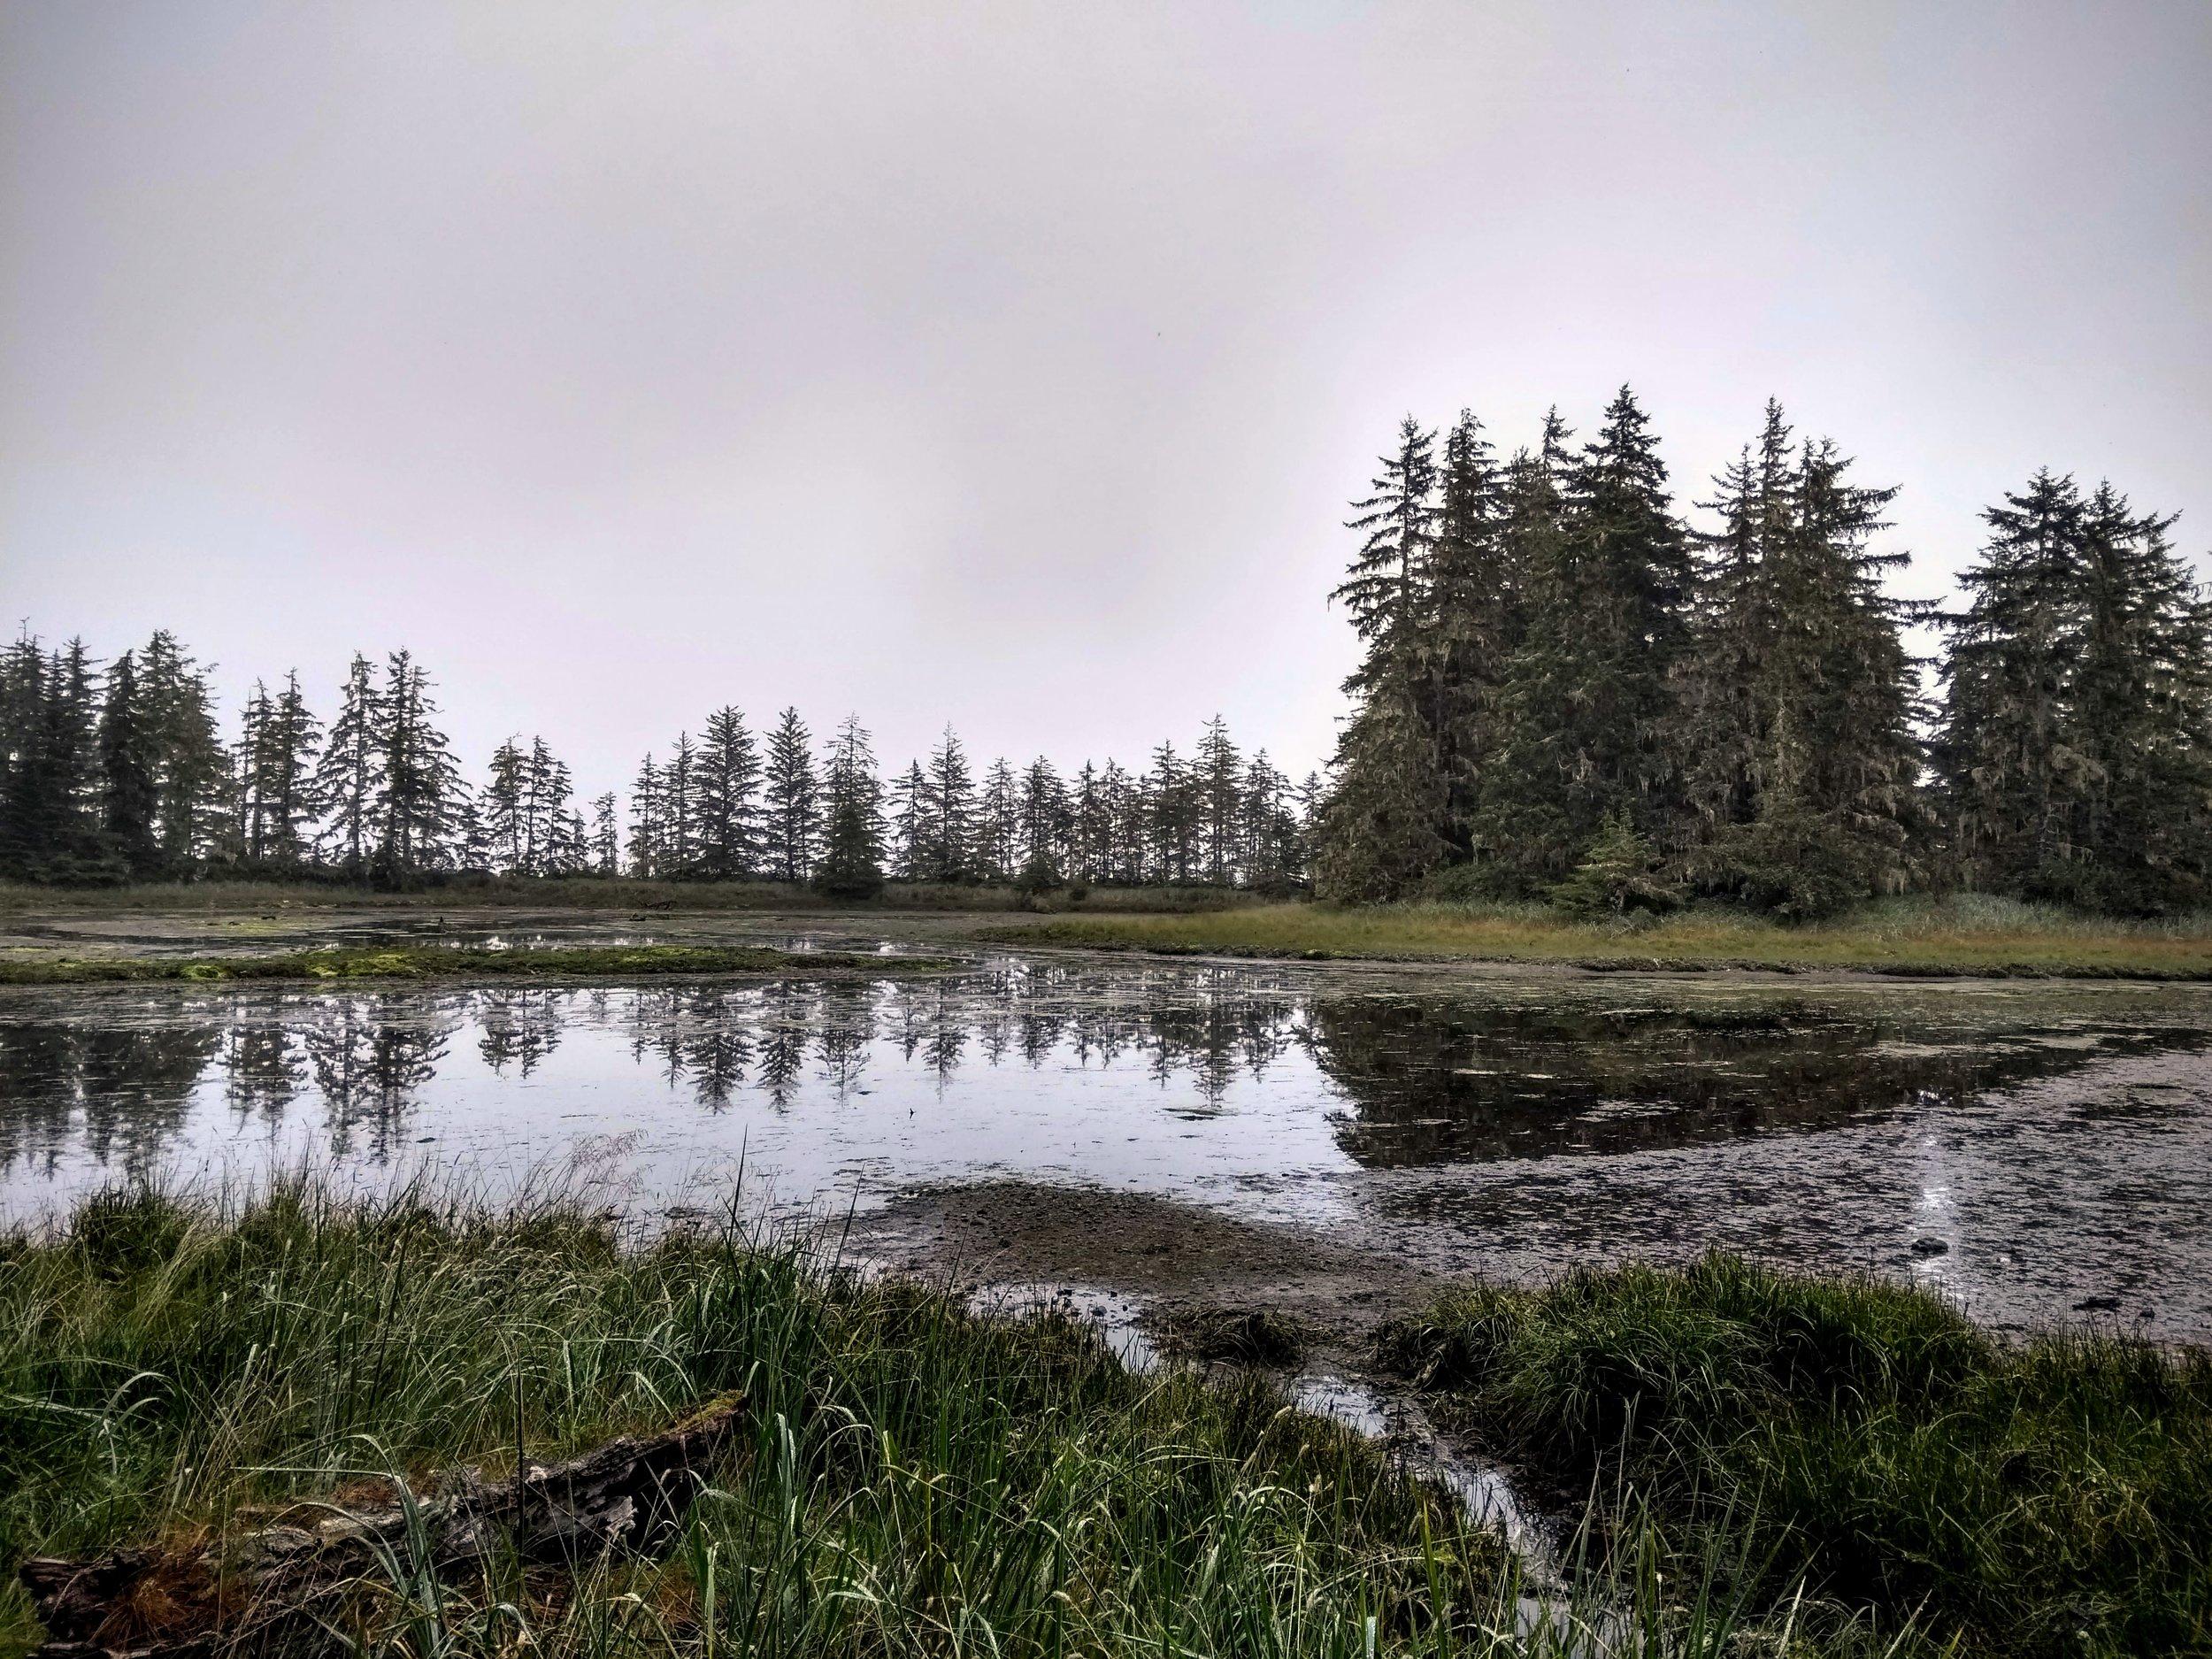 Salt Marsh in the Cluxewe River Estuary